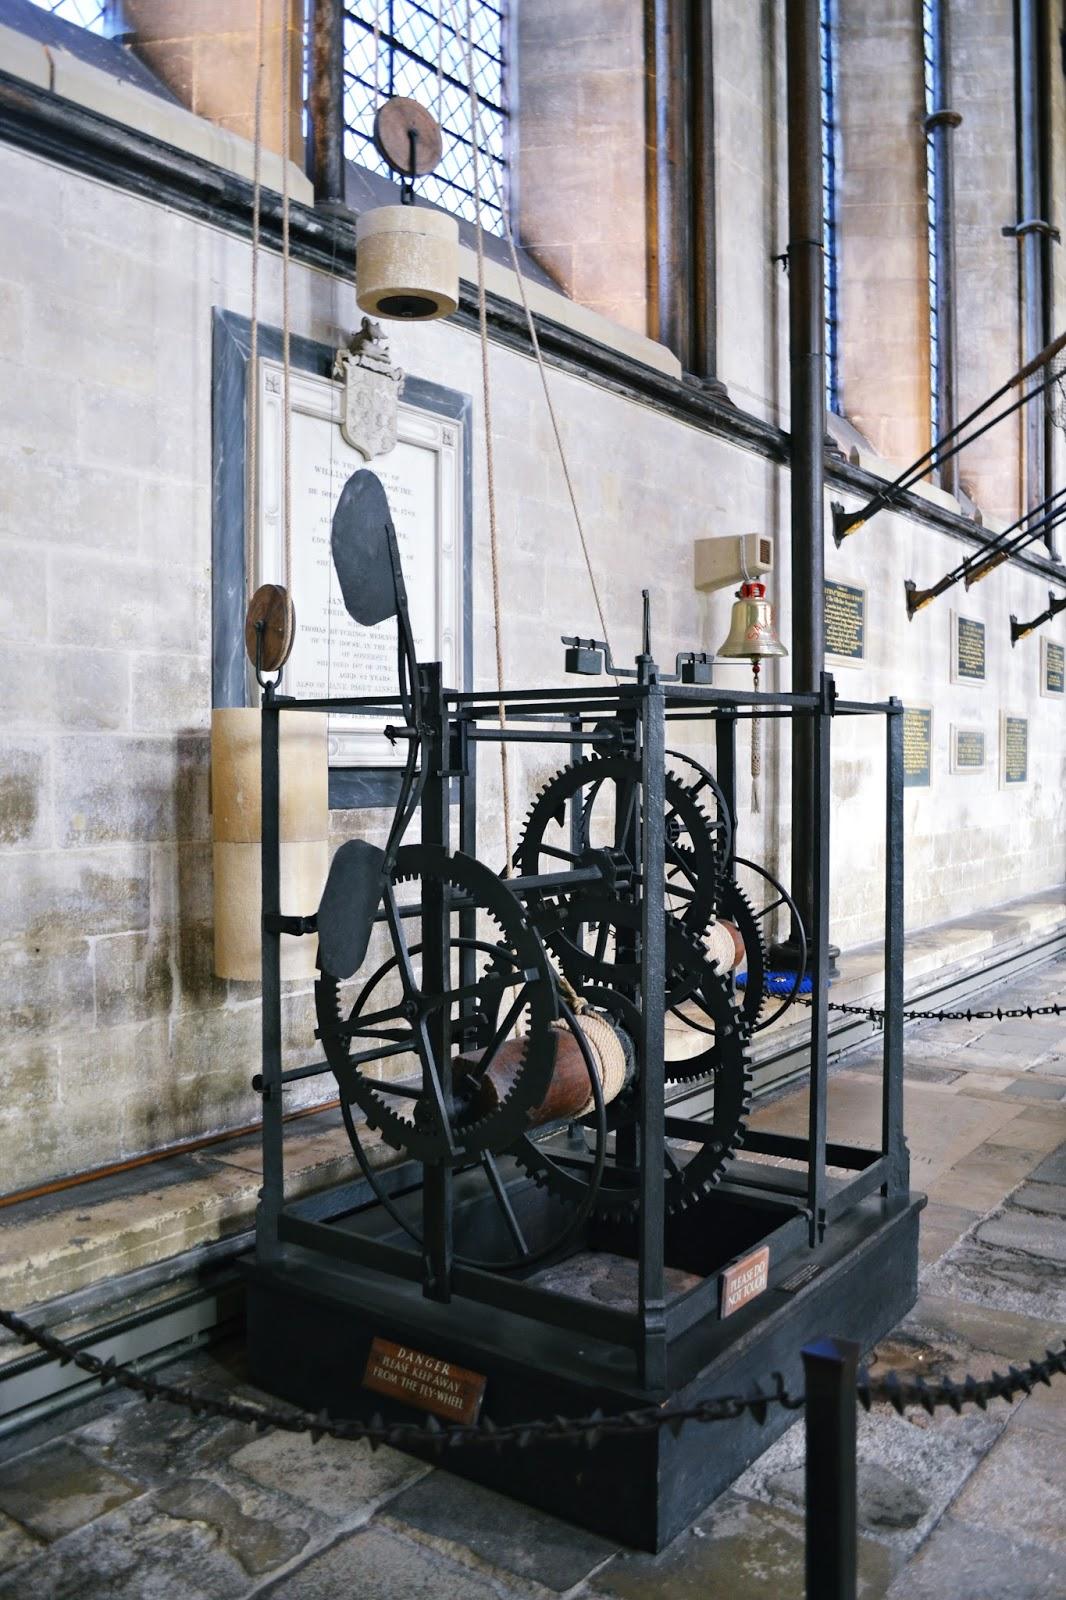 salisbury cathedral medieval clock